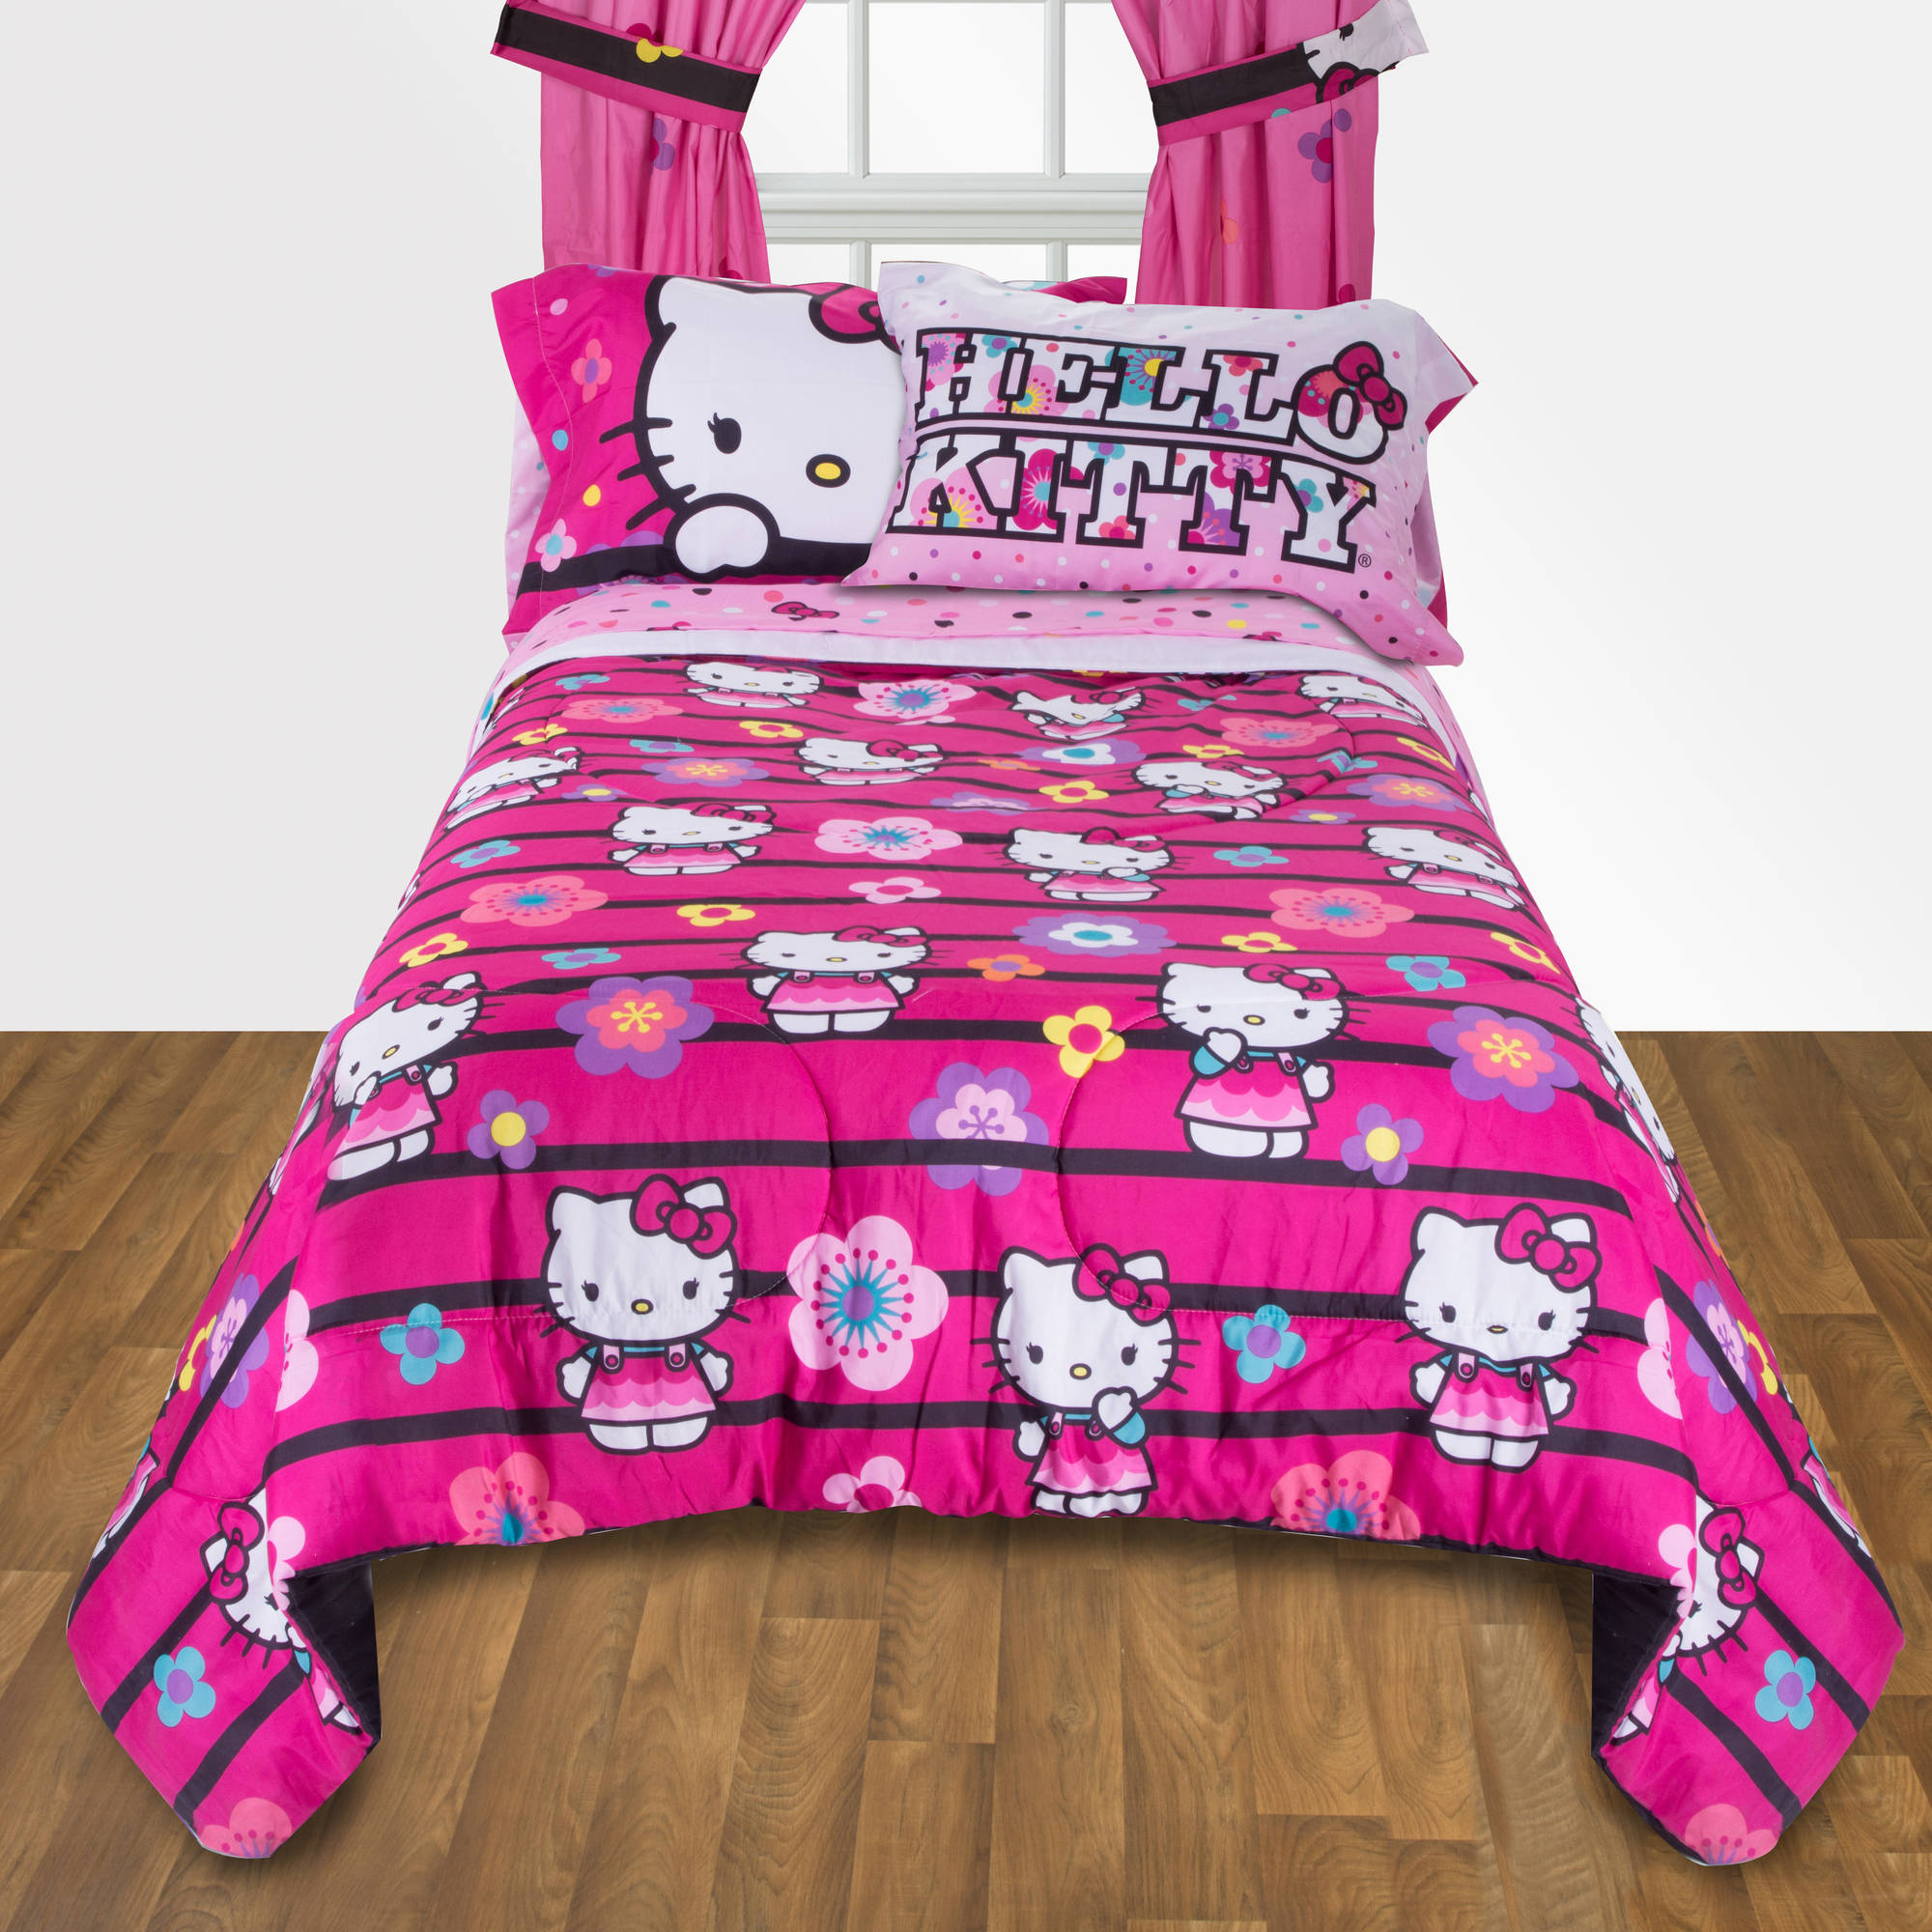 Hello kitty bed set walmart - Hello Kitty Floral Ombre Reversible Twin Full Bedding Comforter Walmart Com